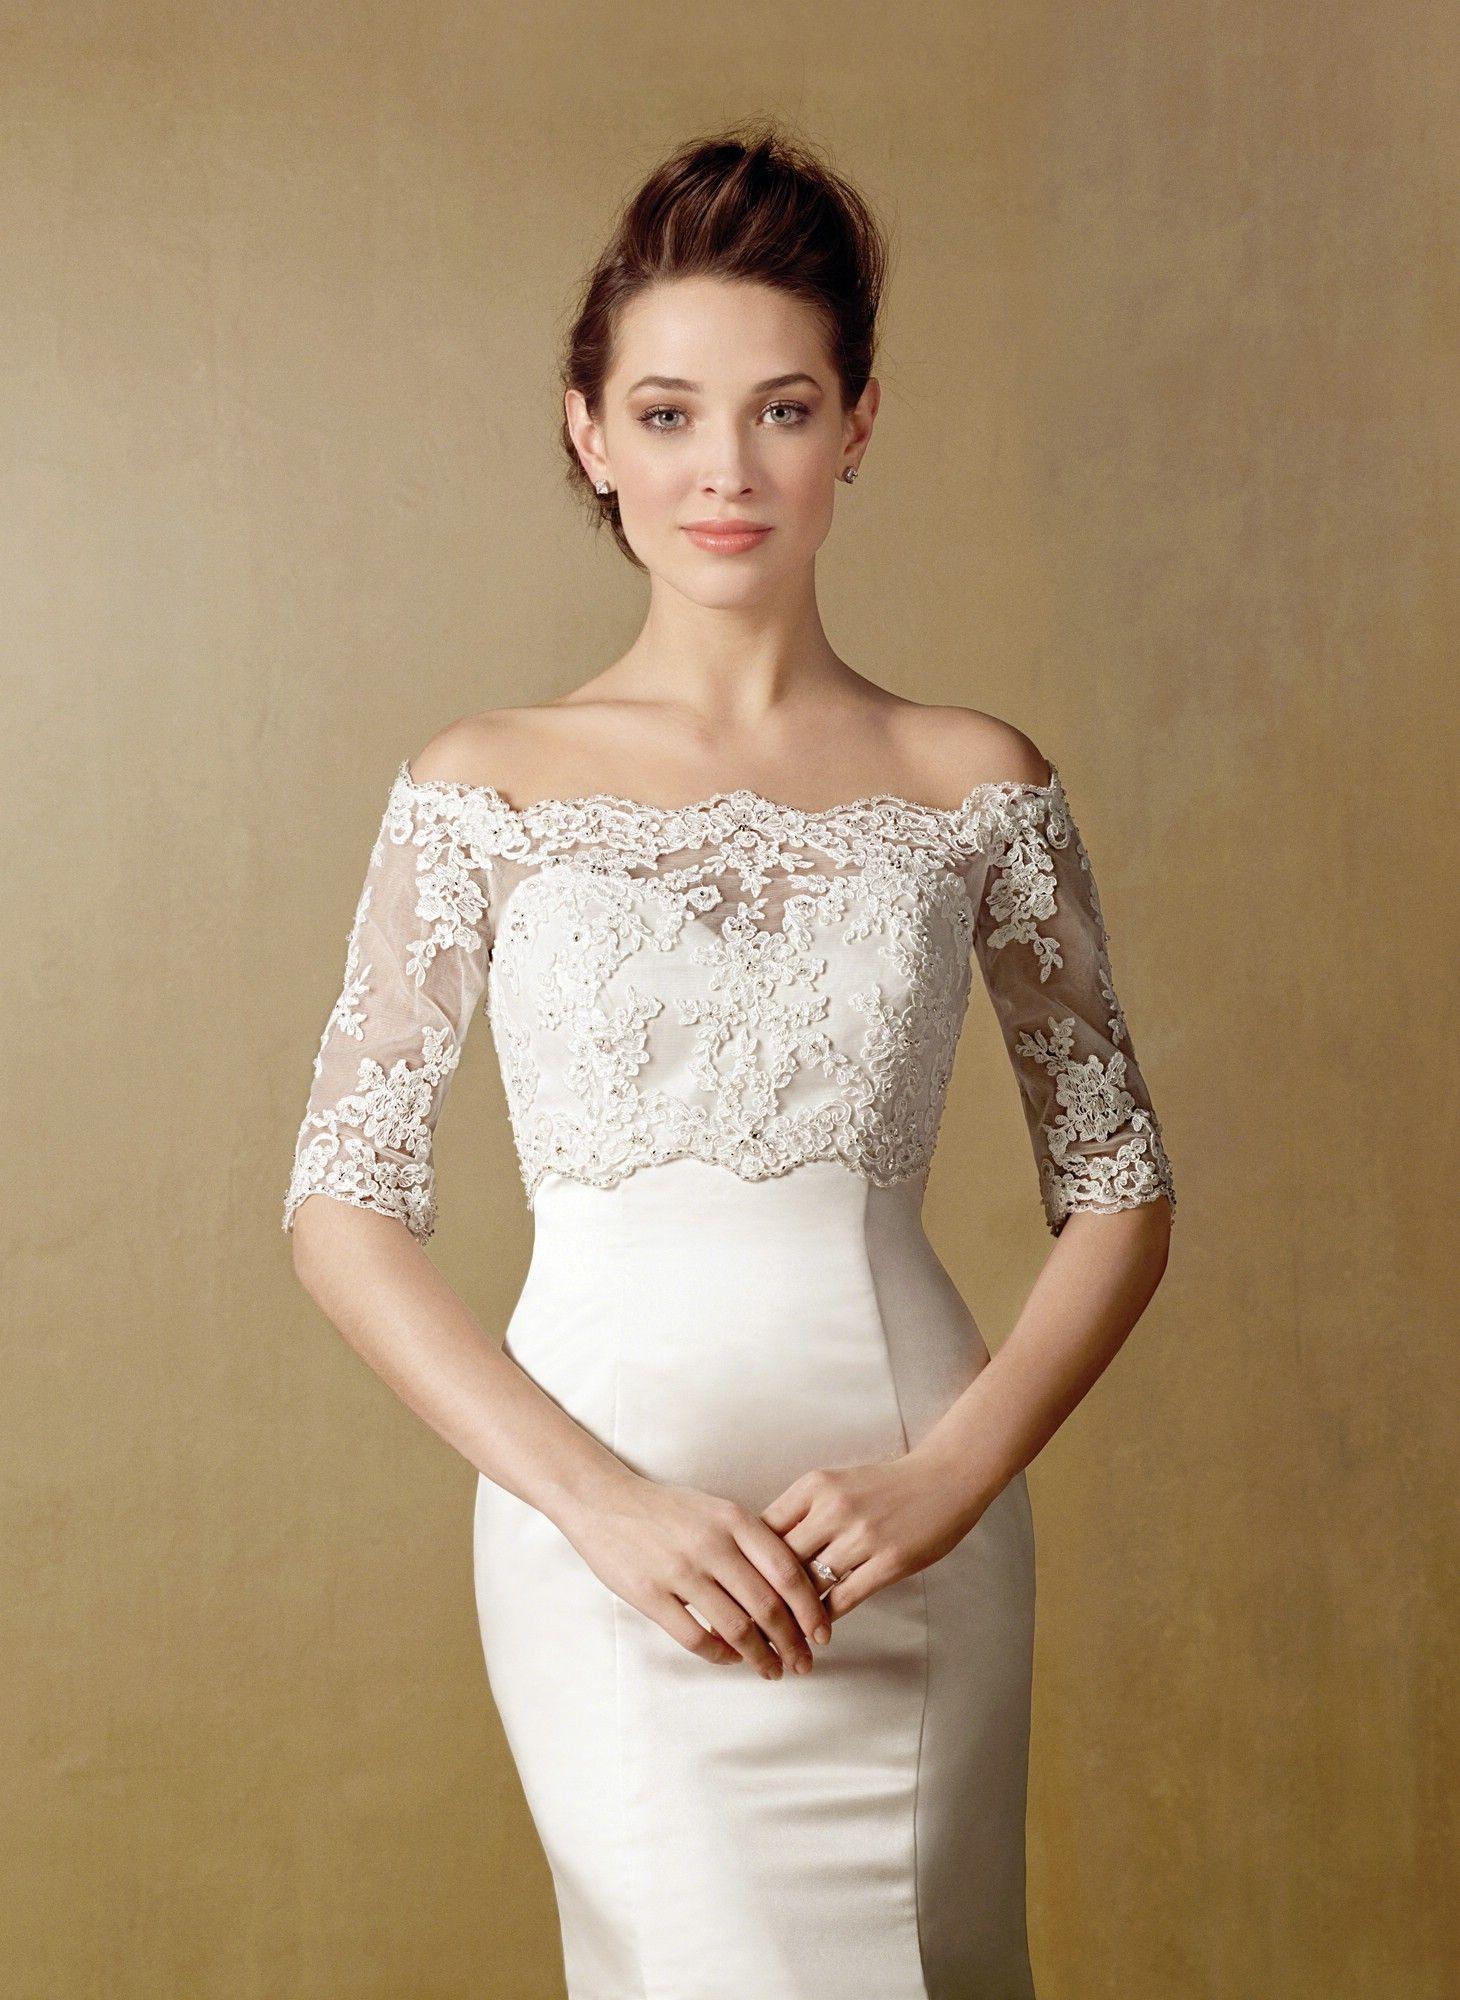 Alfred angelo wedding jacket style 2462 2462 16900 alfred angelo wedding jacket style 2462 2462 16900 wedding dresses ombrellifo Choice Image